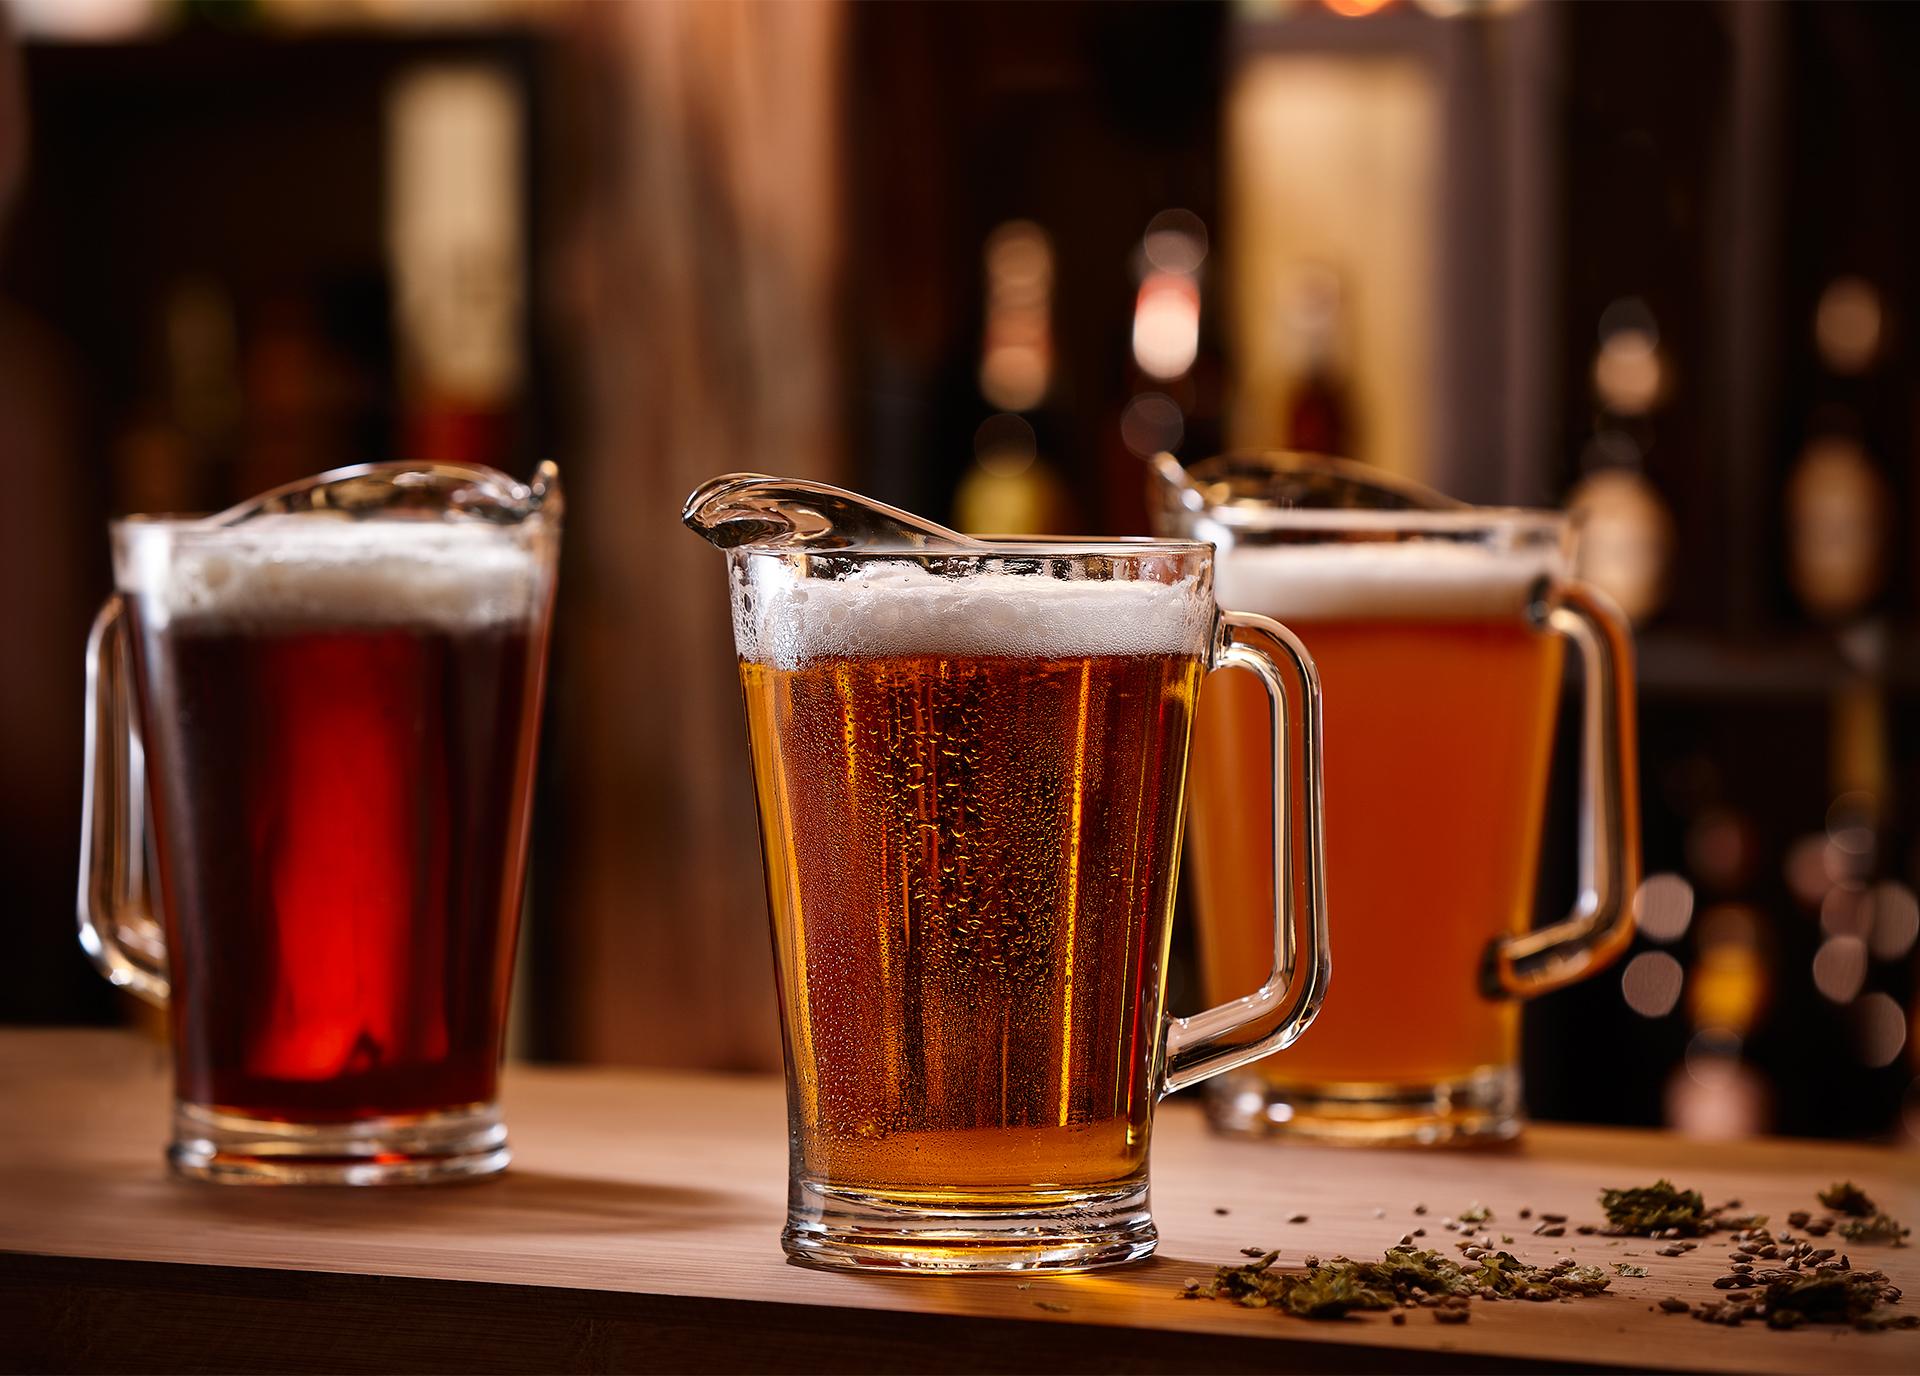 beer-photographer-microbrewery-2-tango-photography